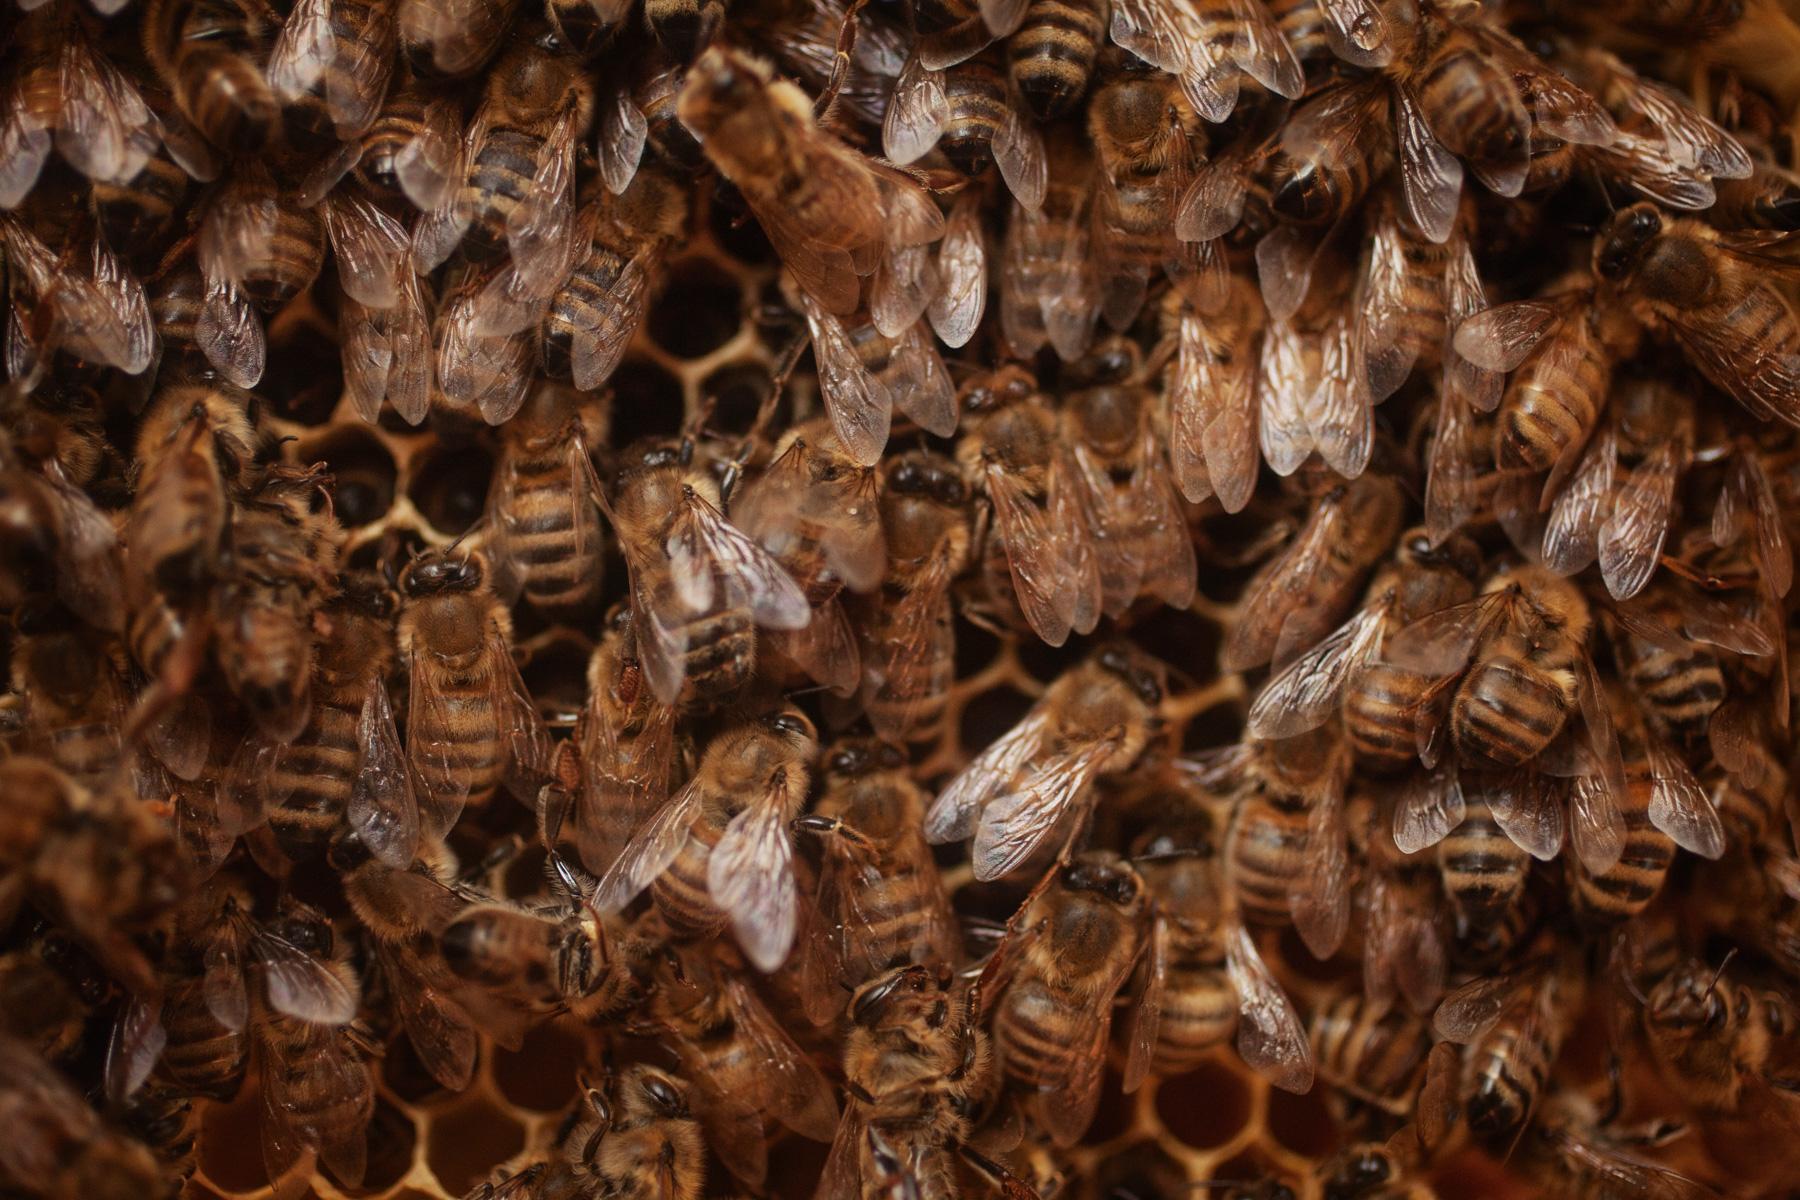 bees-hive-farm